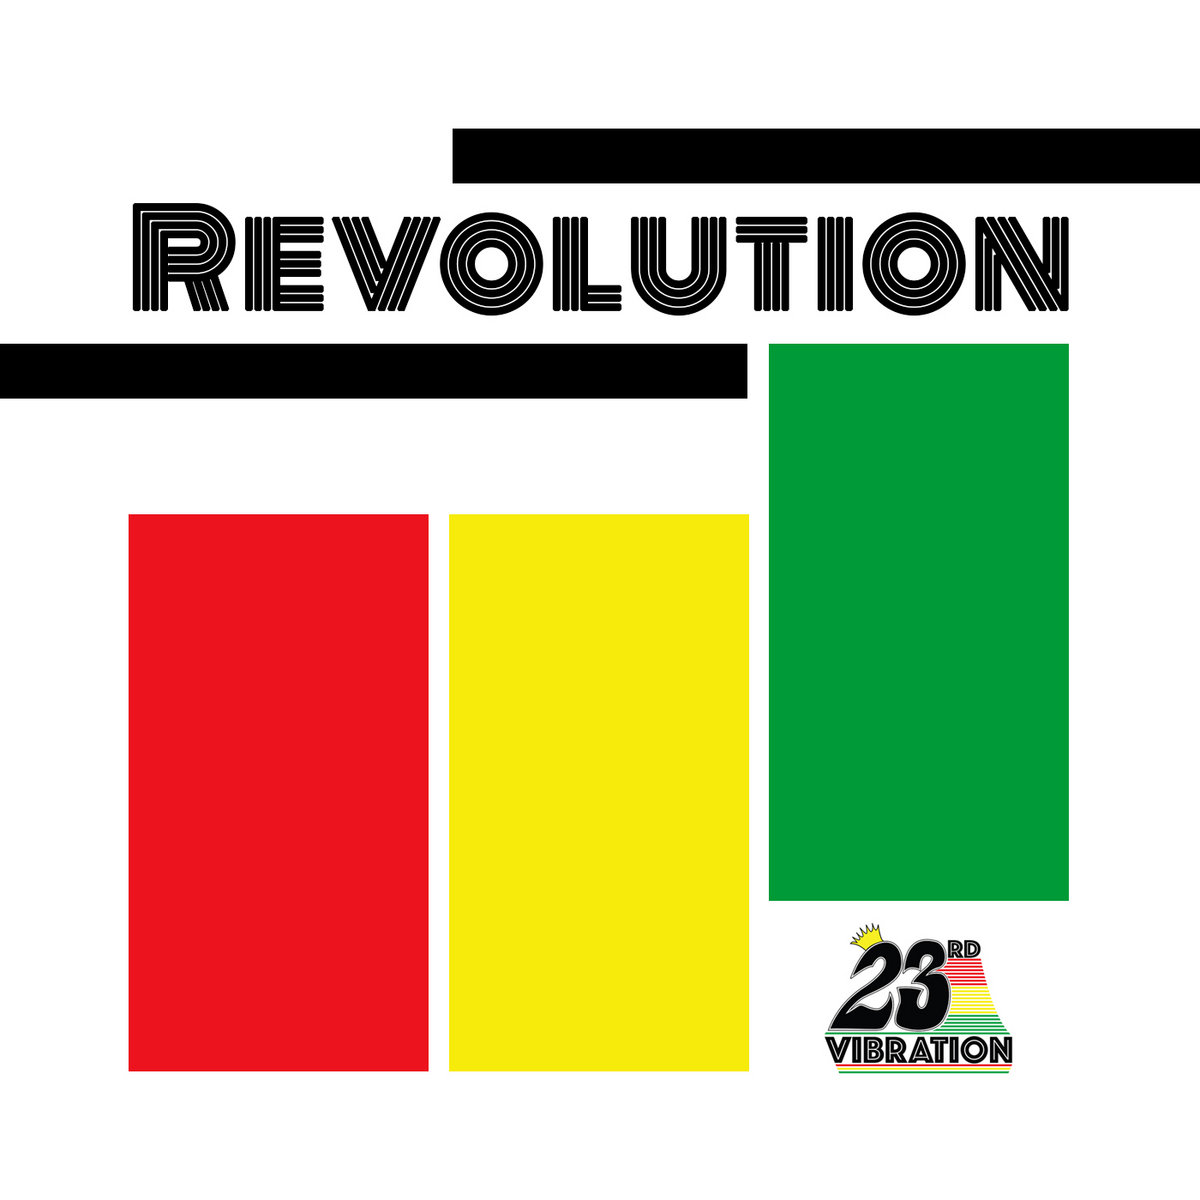 Revolution by 23rd Vibration